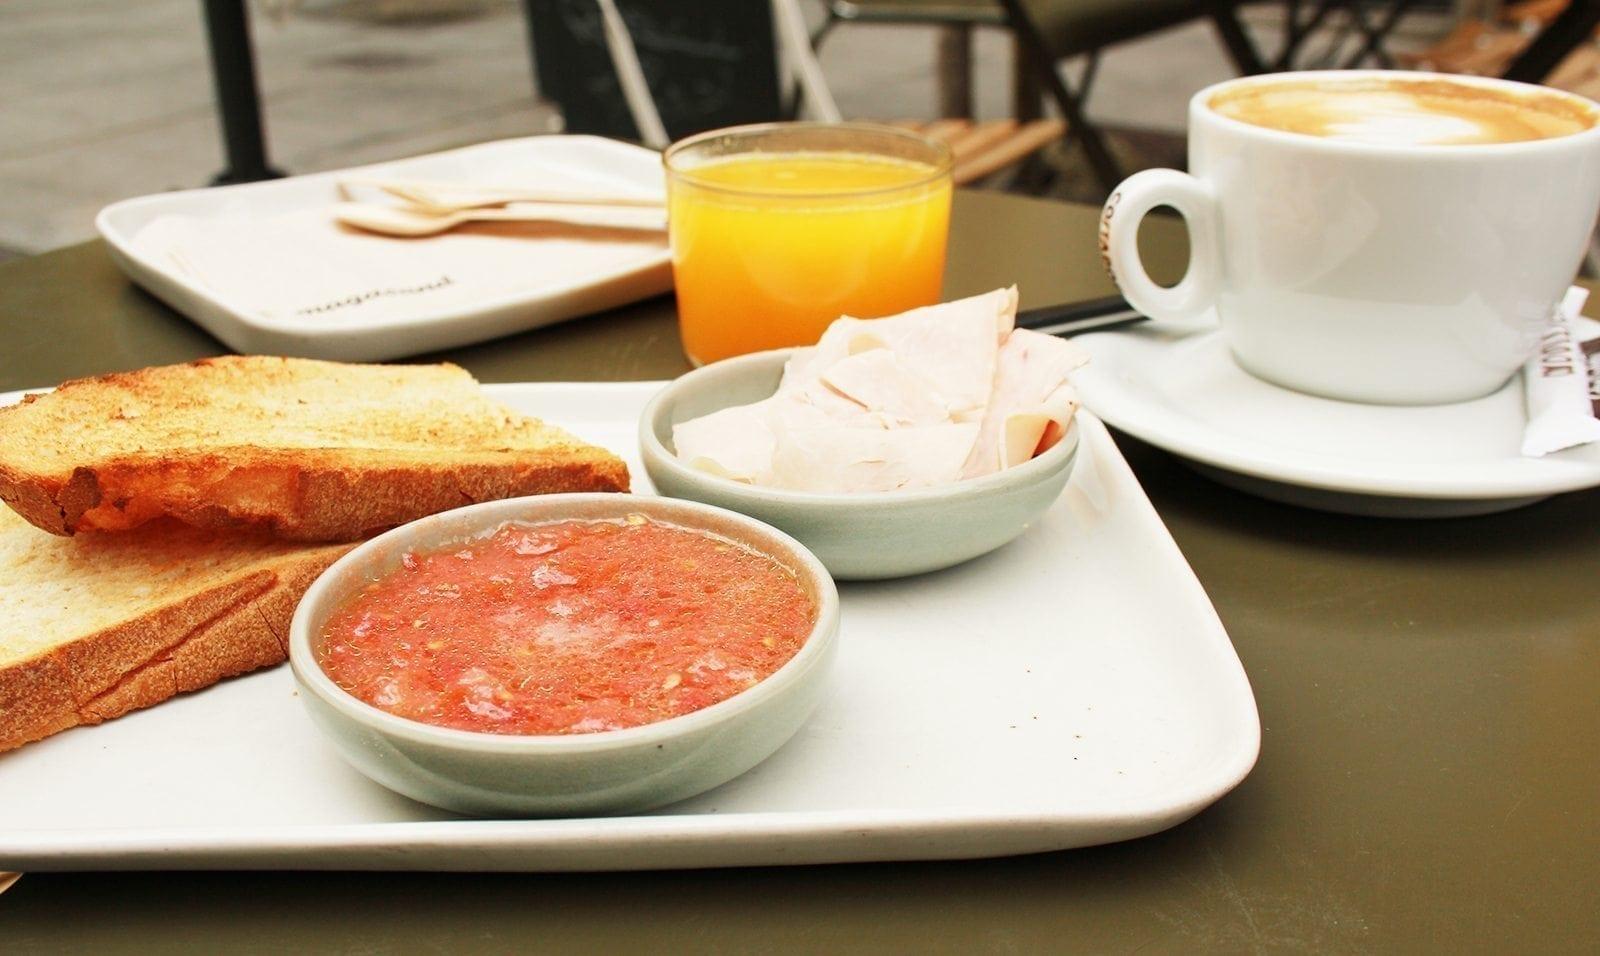 desayuno, sano, breakfast, pan, payés, magasand